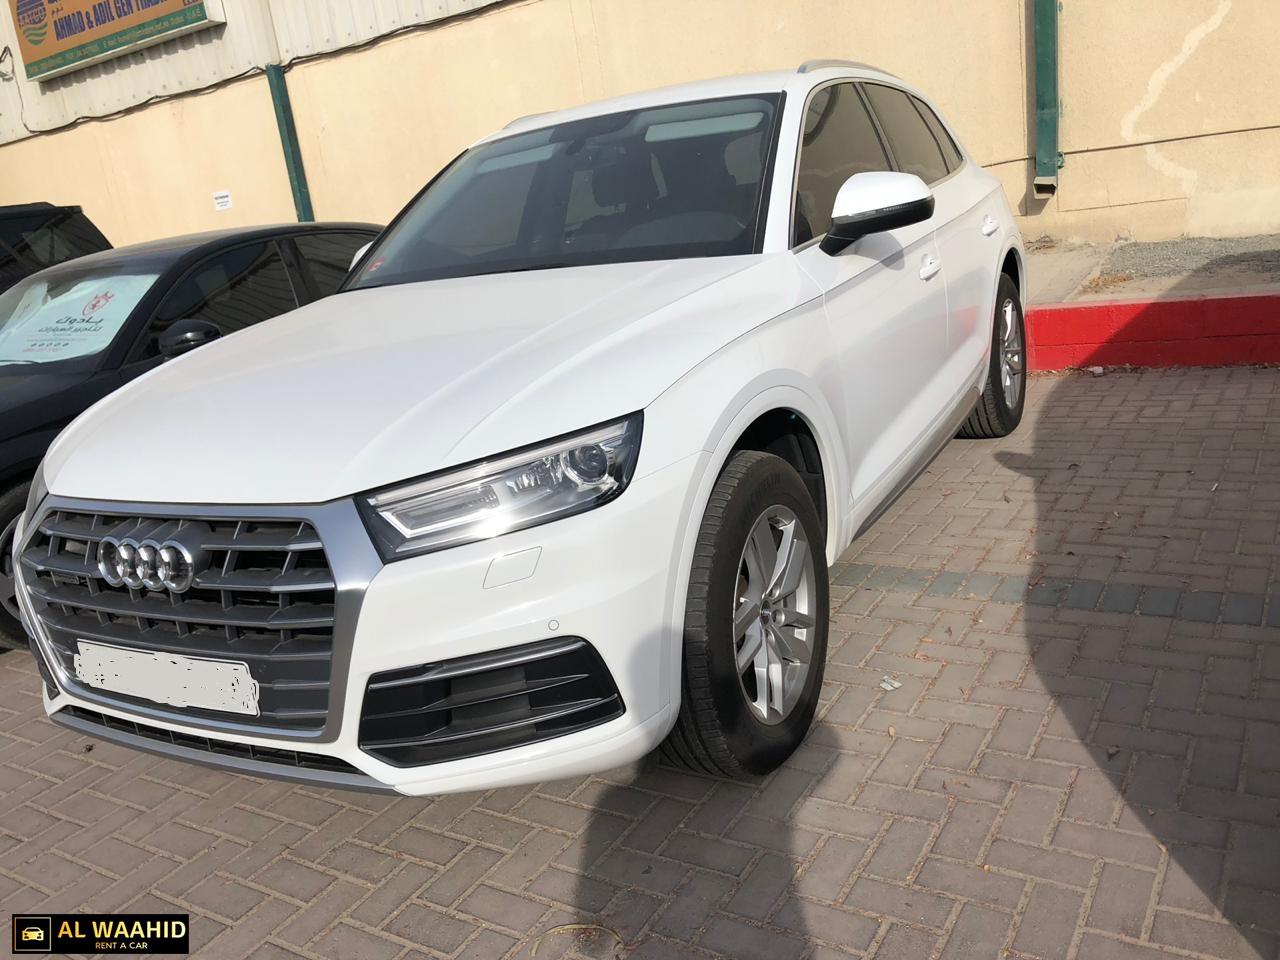 Audi Q5 2018 White rental dubai luxury car renal dubai